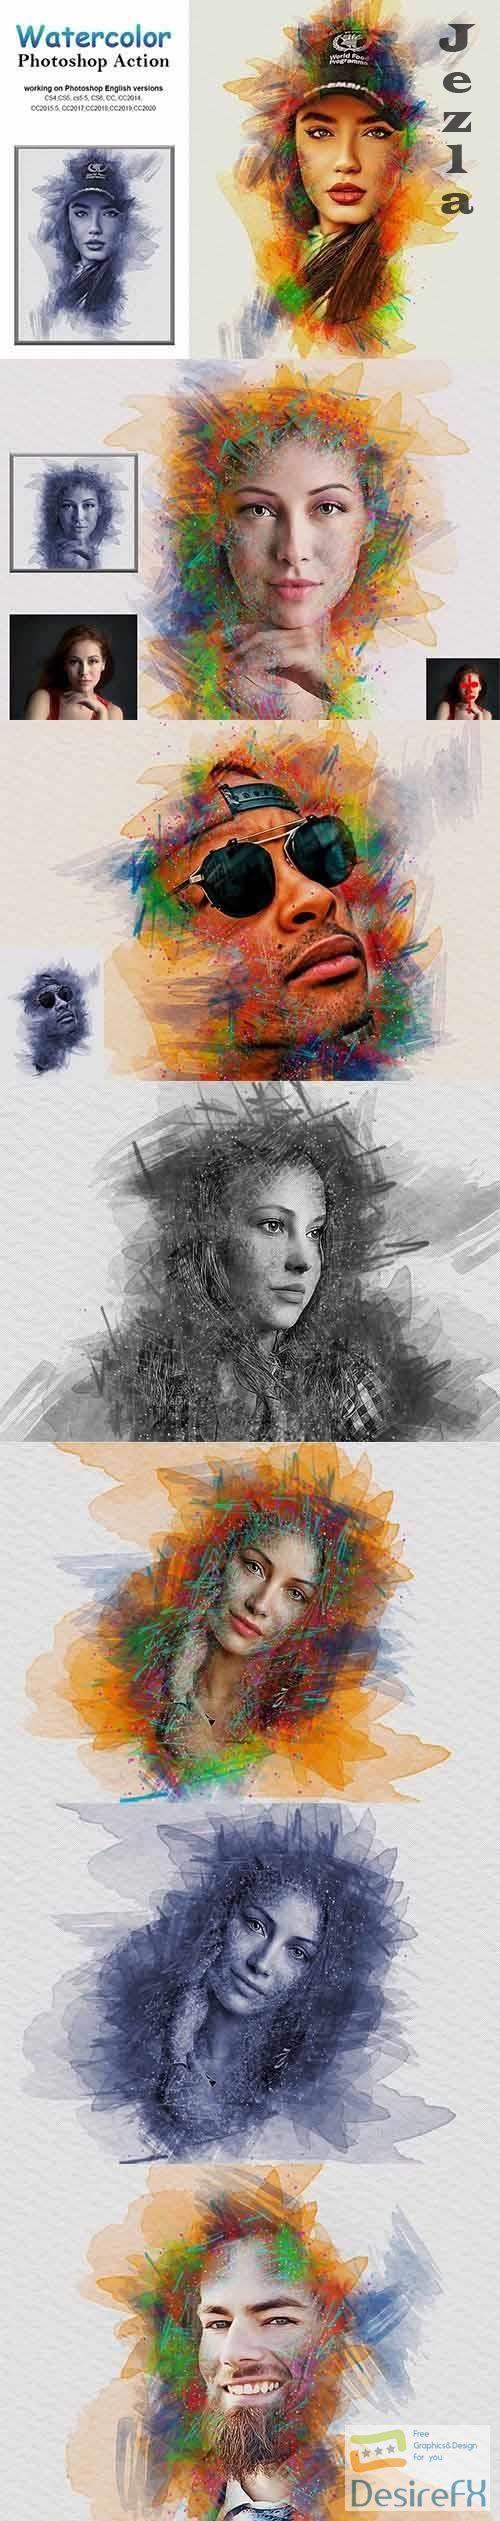 CreativeMarket - Watercolor Photoshop Action 5232780